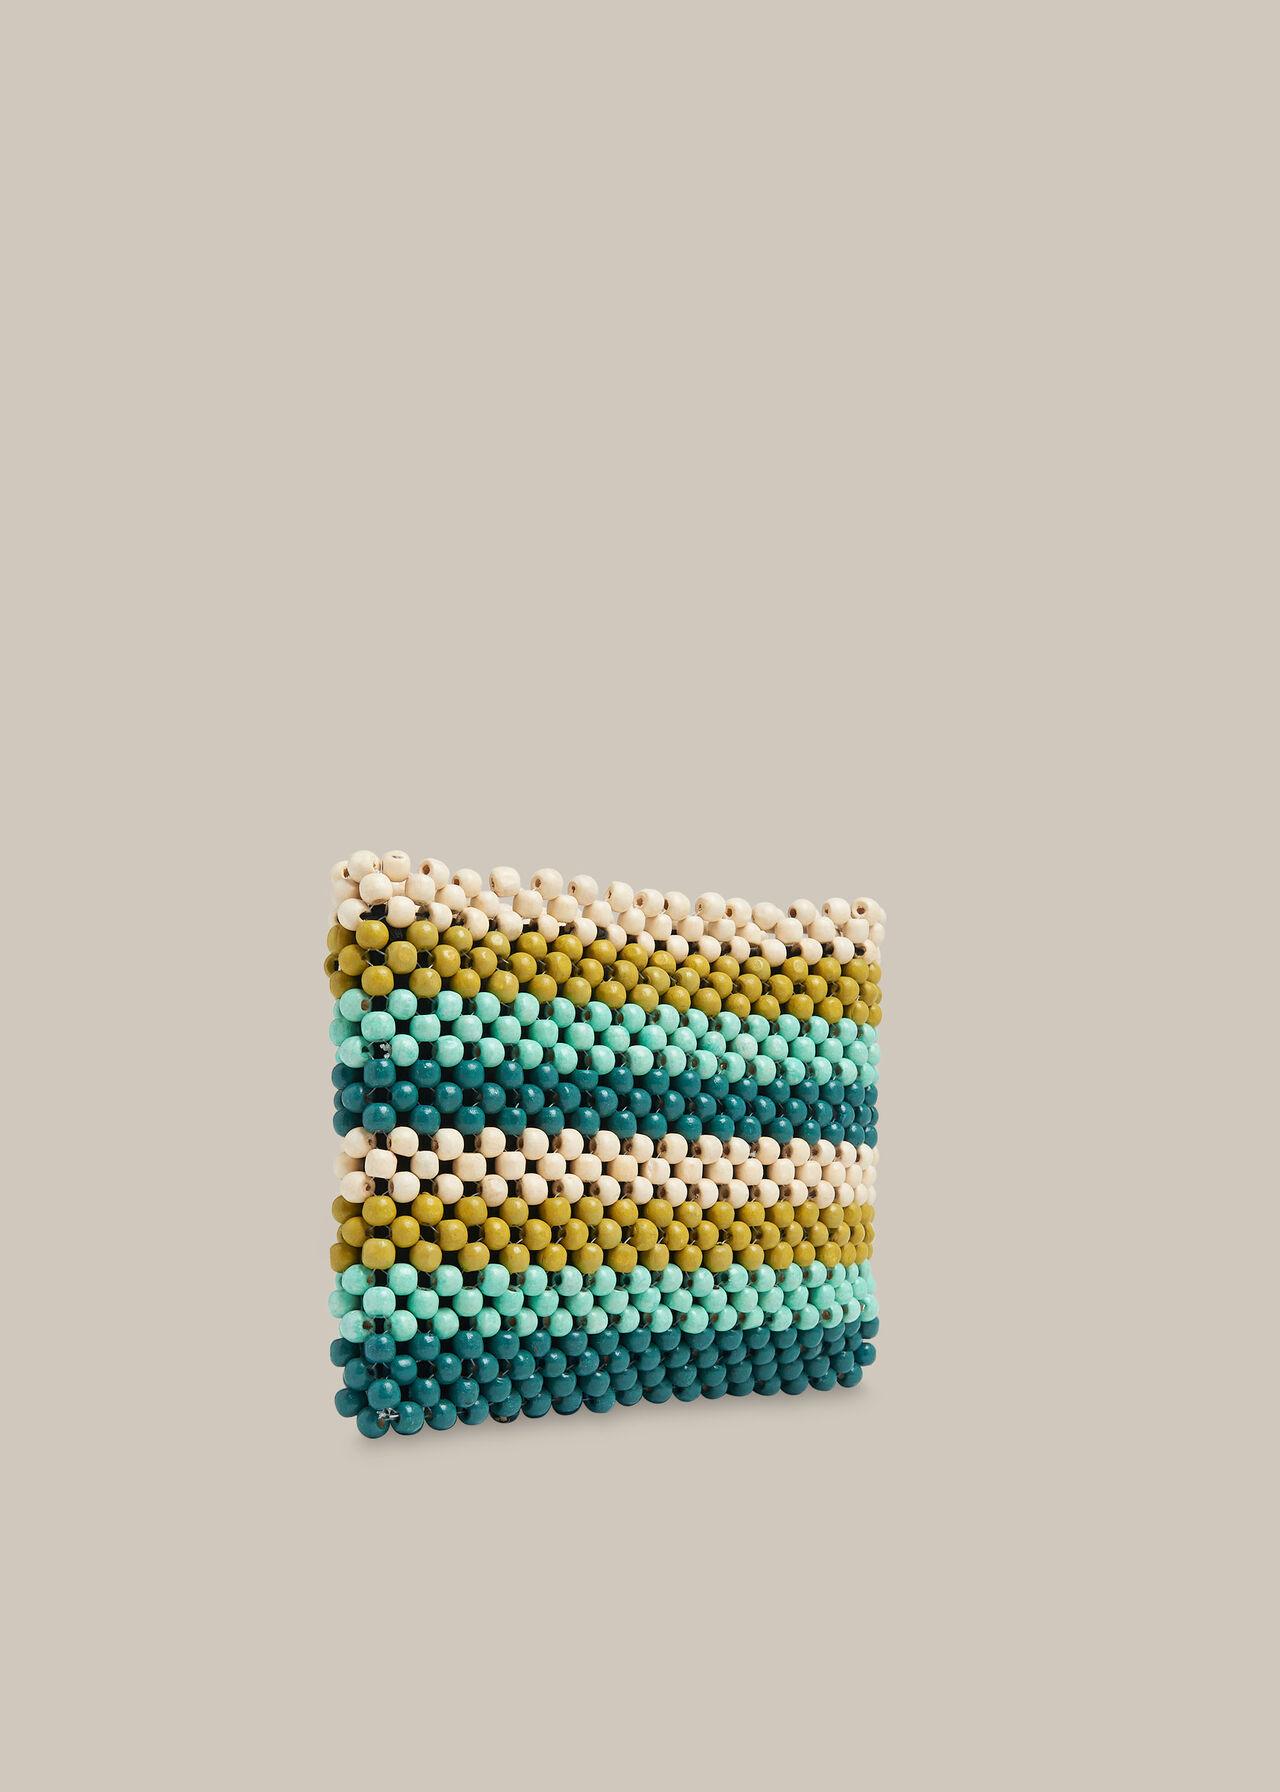 Safah Striped Beaded Clutch Green